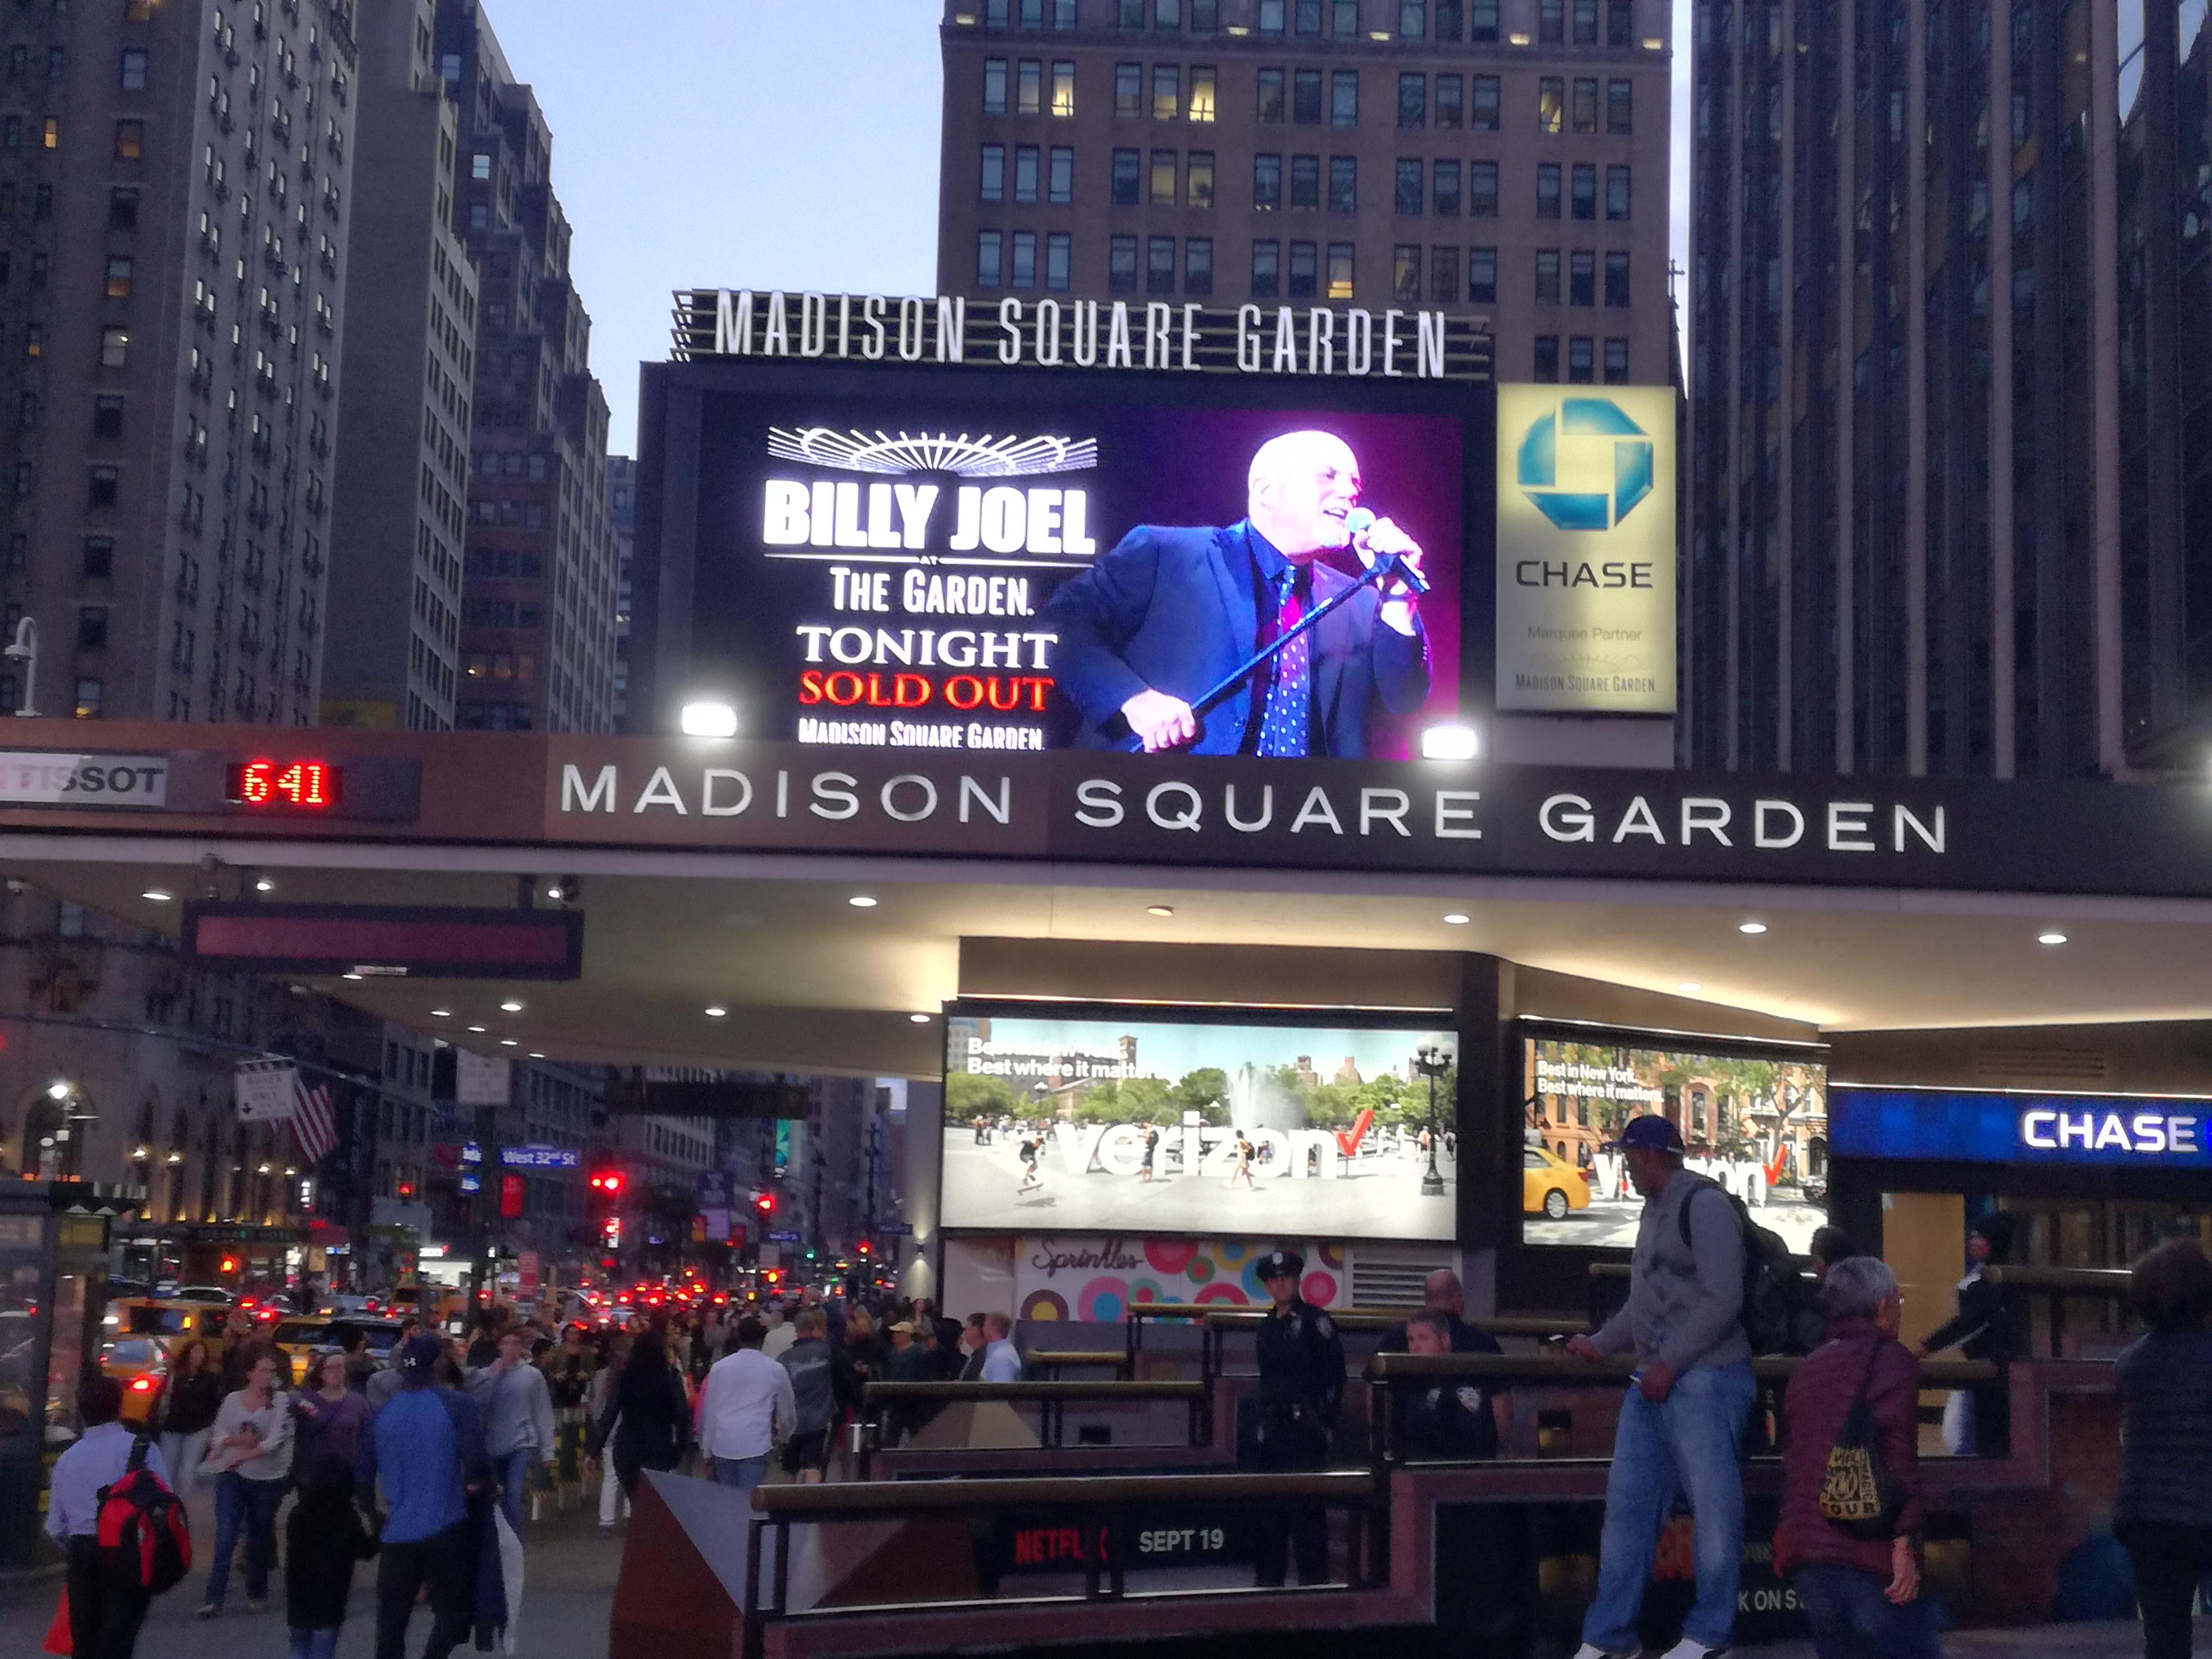 Billy joel at madison square garden september 30 2017 Billy joel madison square garden setlist